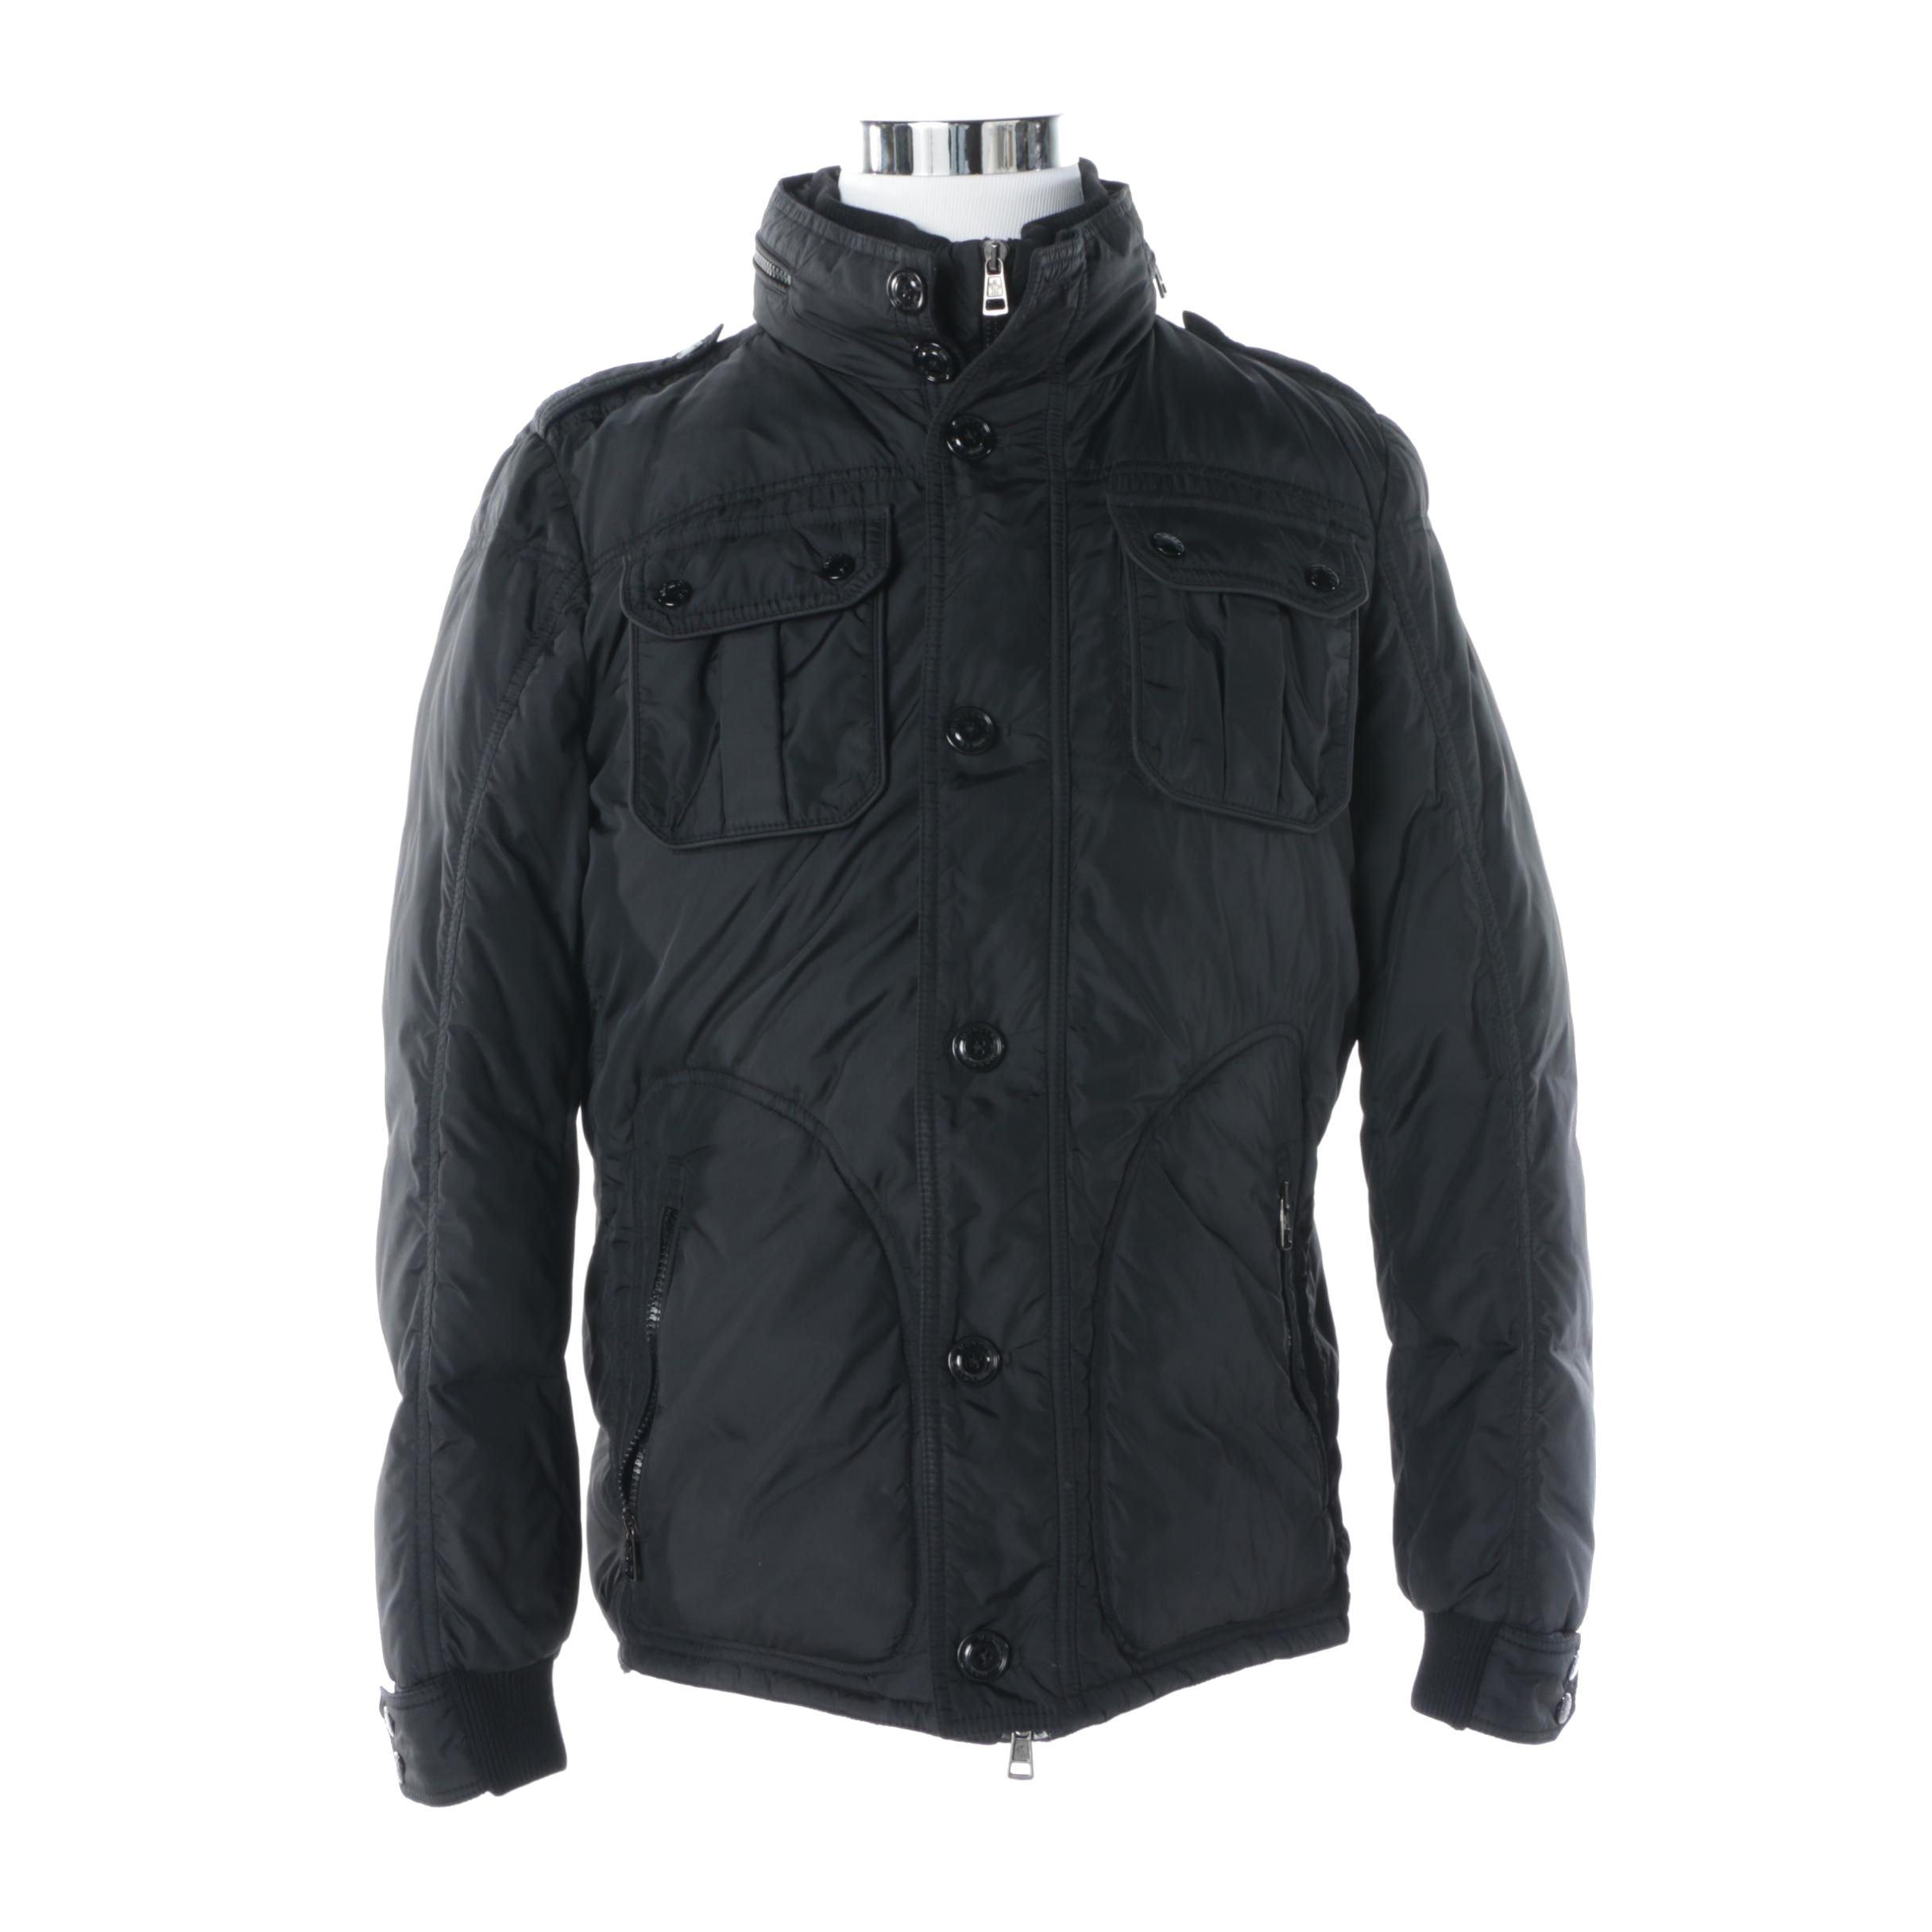 Men's Moncler Black Down Winter Jacket